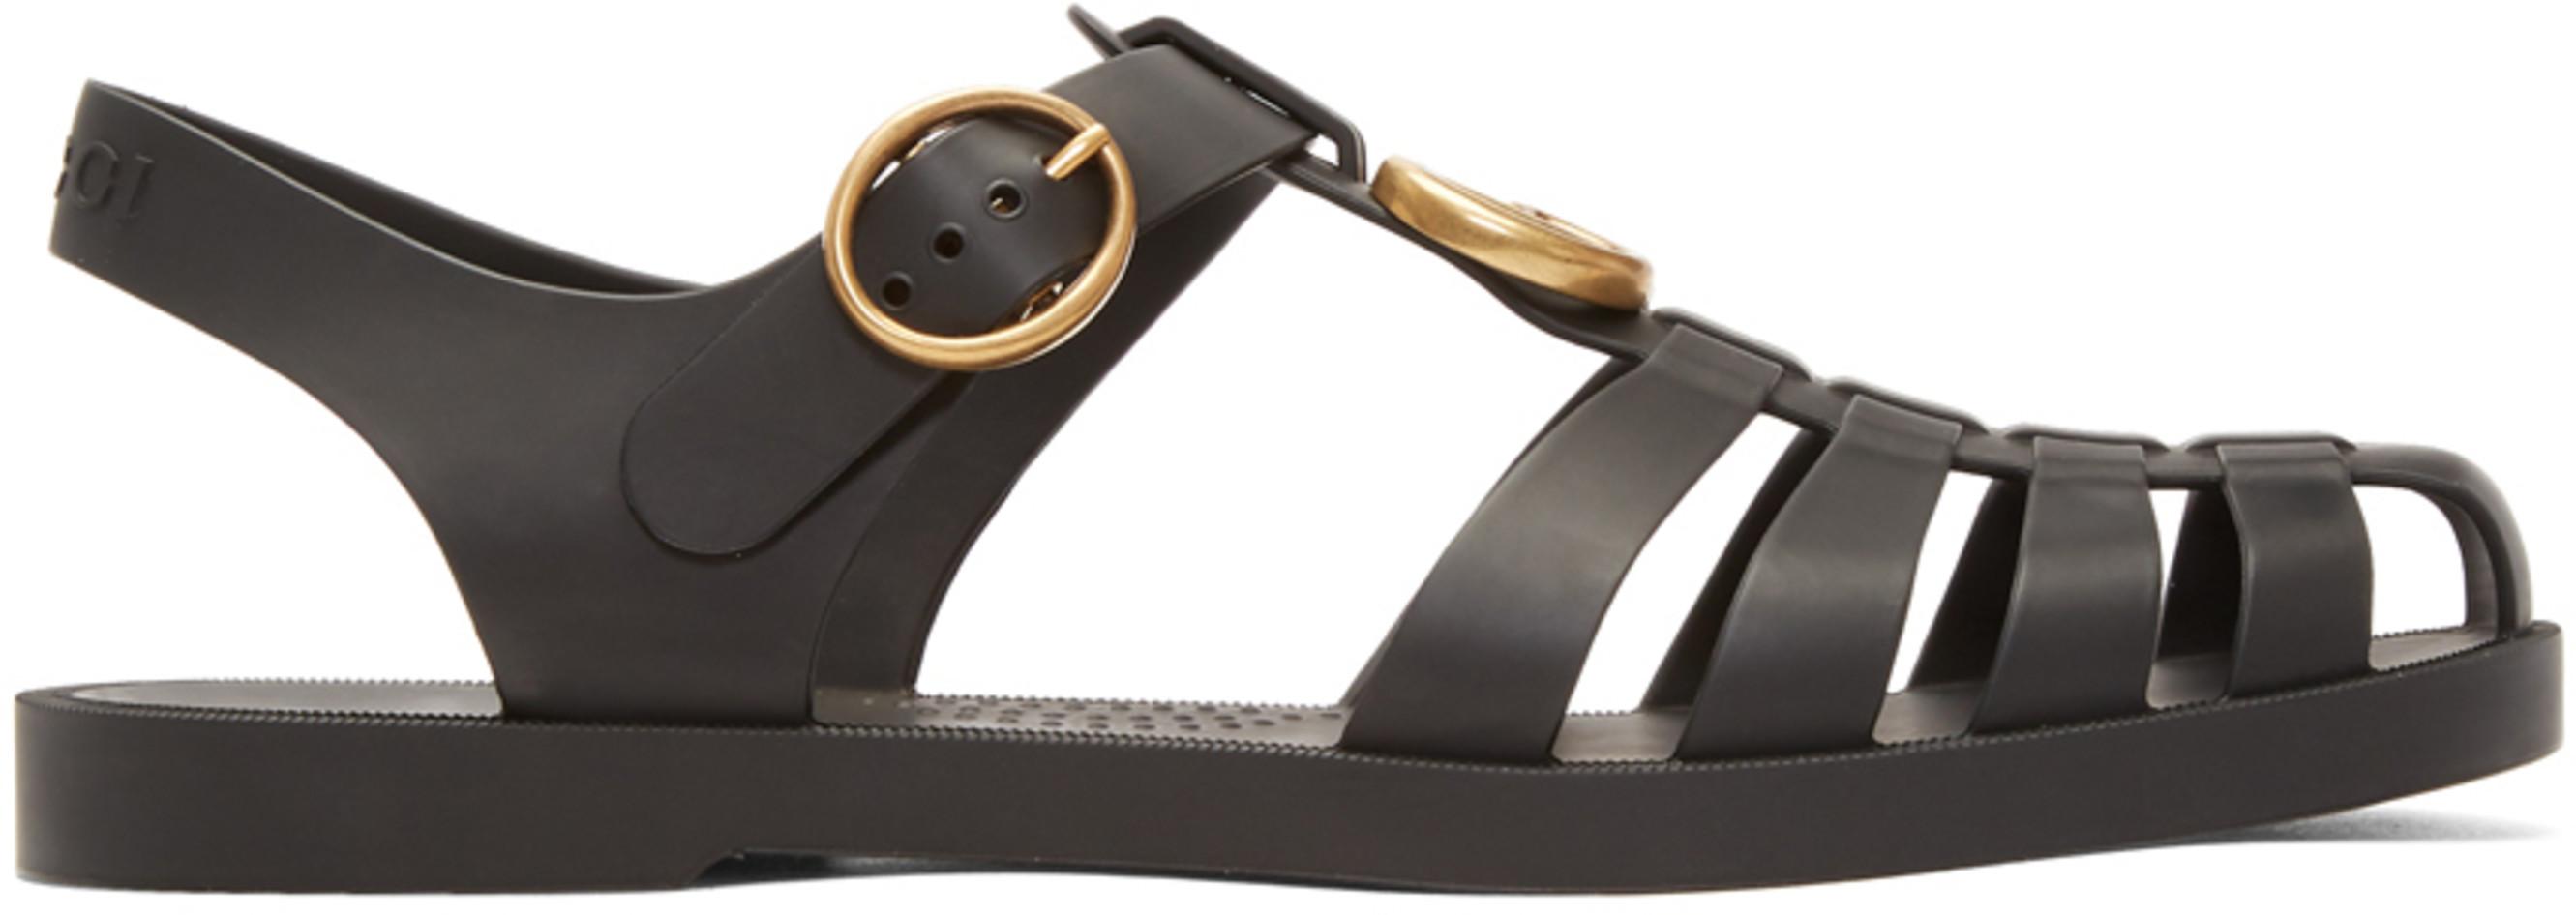 006157581096 Gucci sandals for Men